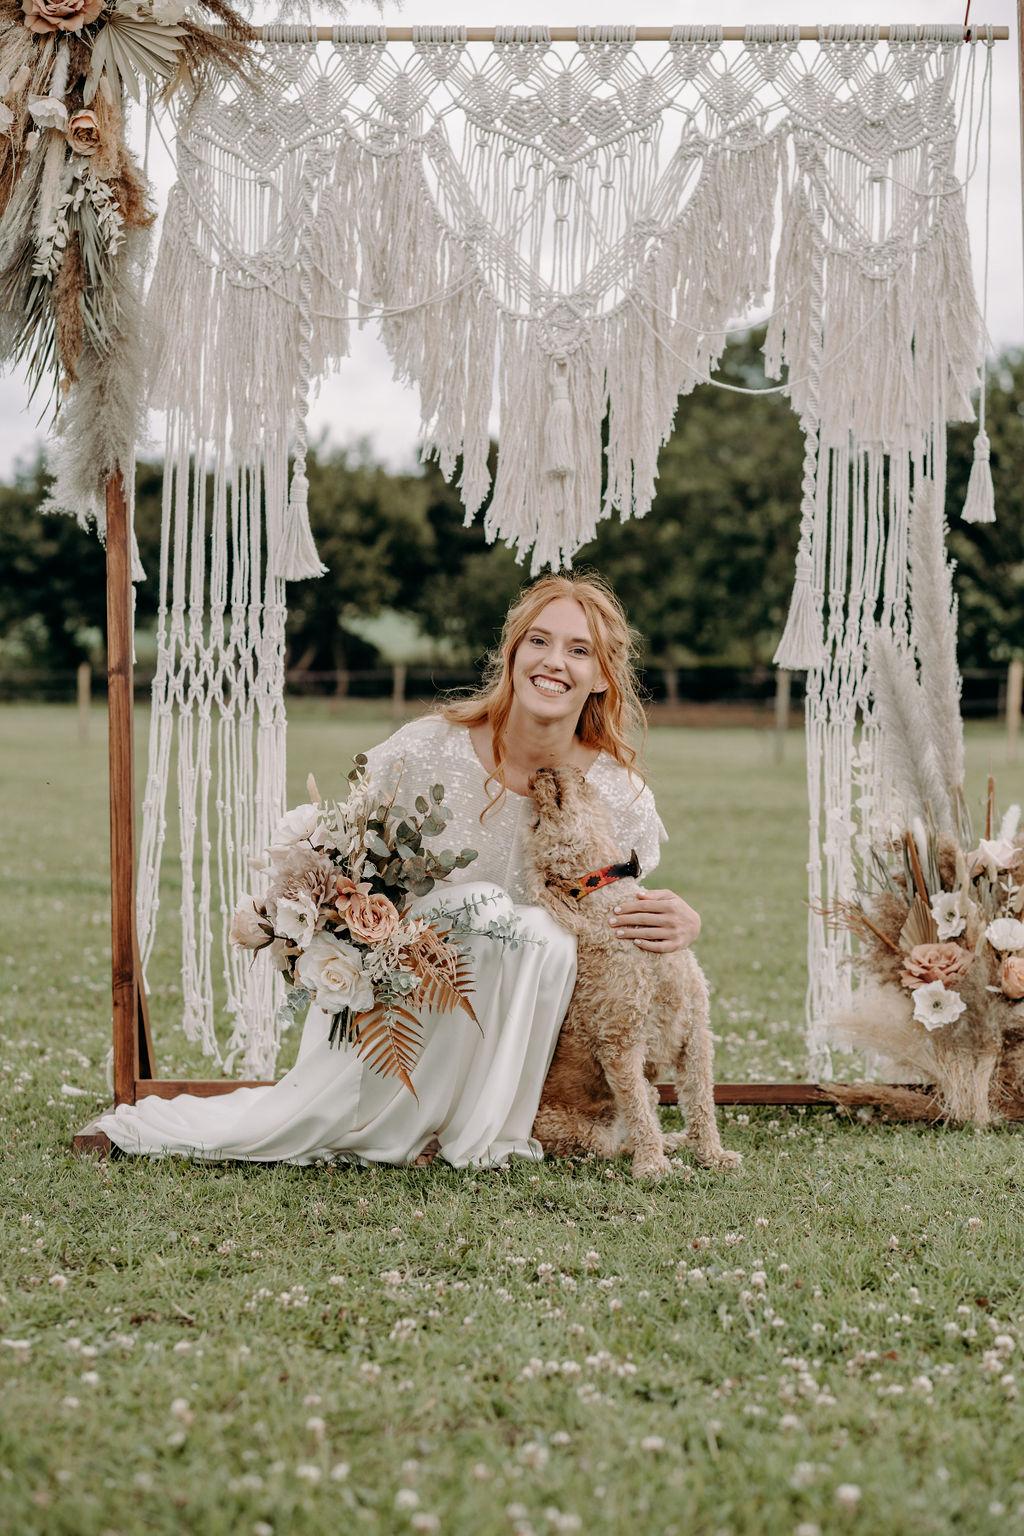 macrame wedding backdrop - sustainable wedding -eco friendly wedding - bohemian wedding styling - unconventional wedding